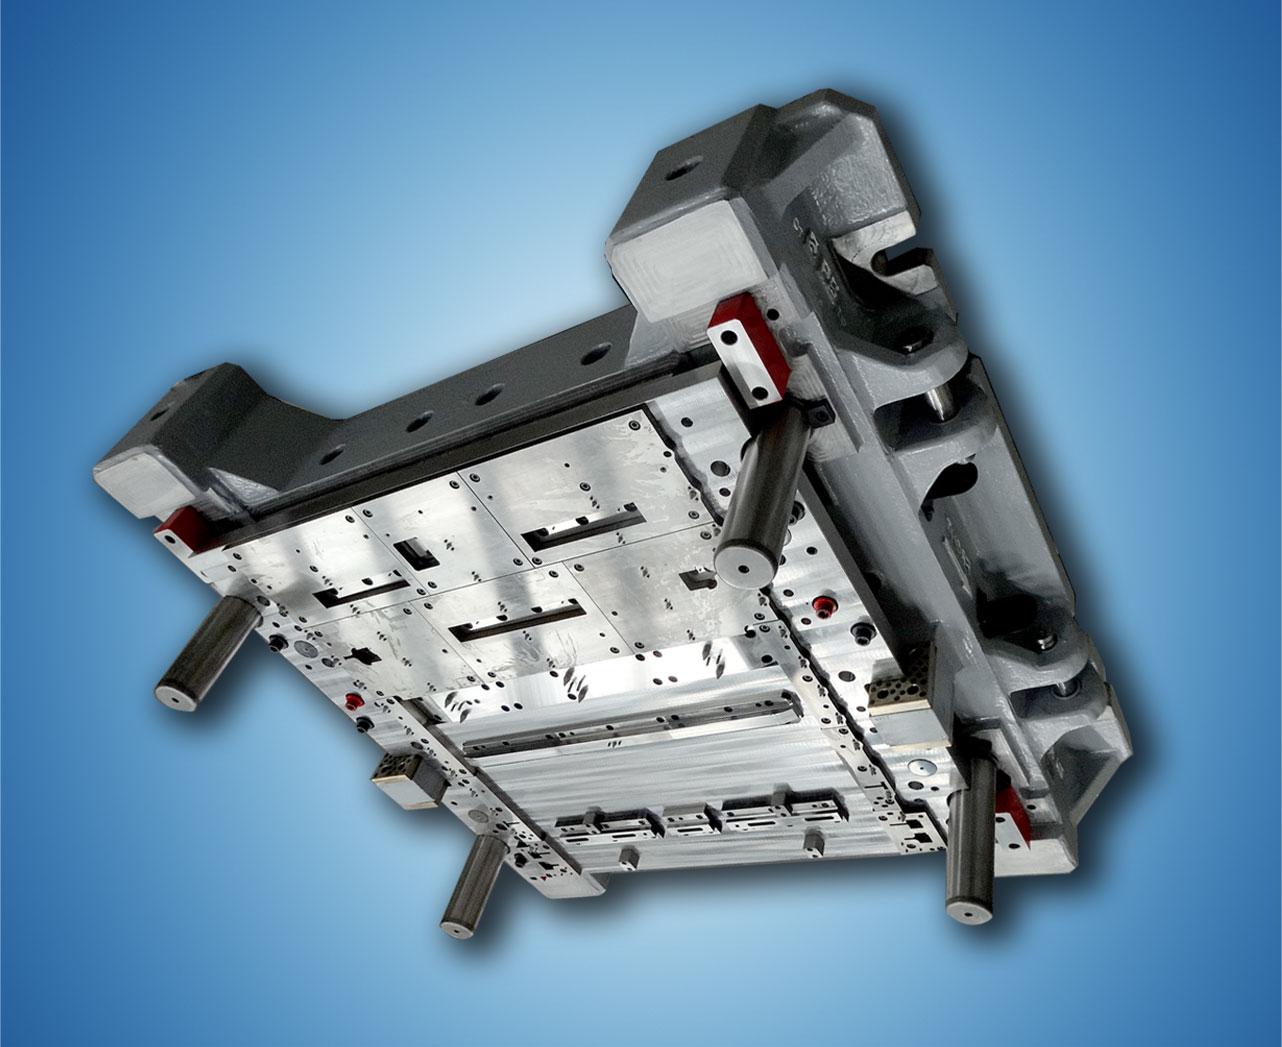 Ero-Projekt-d.o.o.-Toolshop-Werkzeugbau-6-Orodje-za-preoblikov--plocevine-_-slika-2